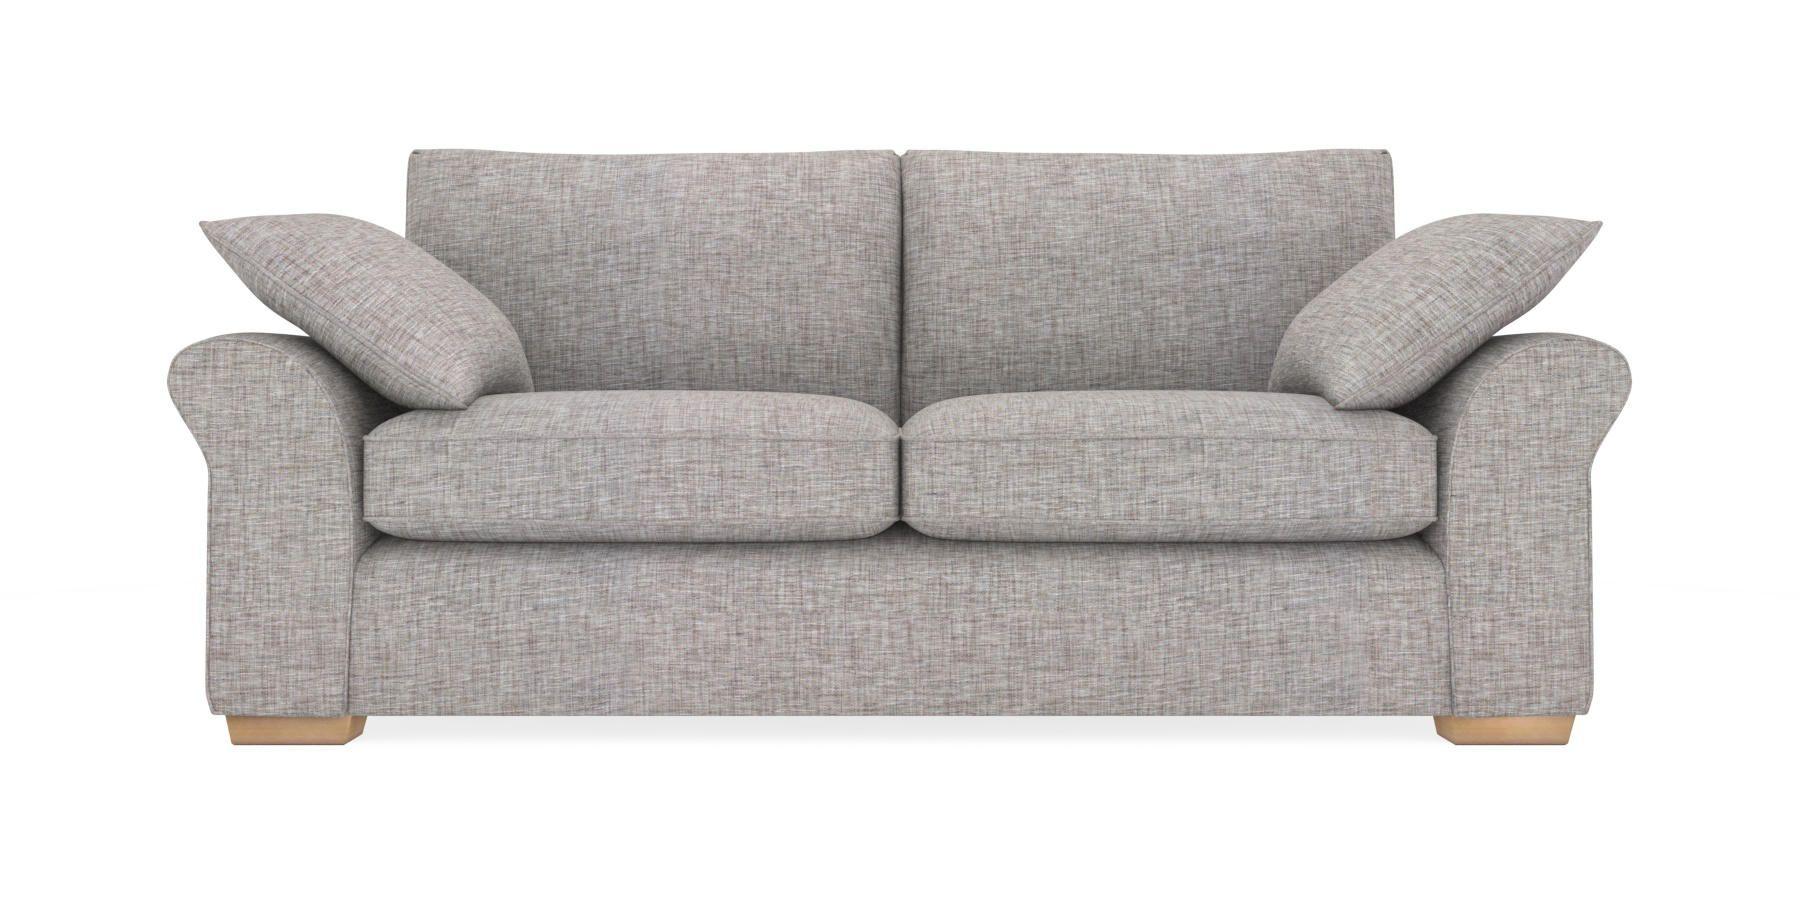 Buy Garda Large Sofa 3 Seats Boucle Blend Light Dove Block Light From The Next Uk Online Shop